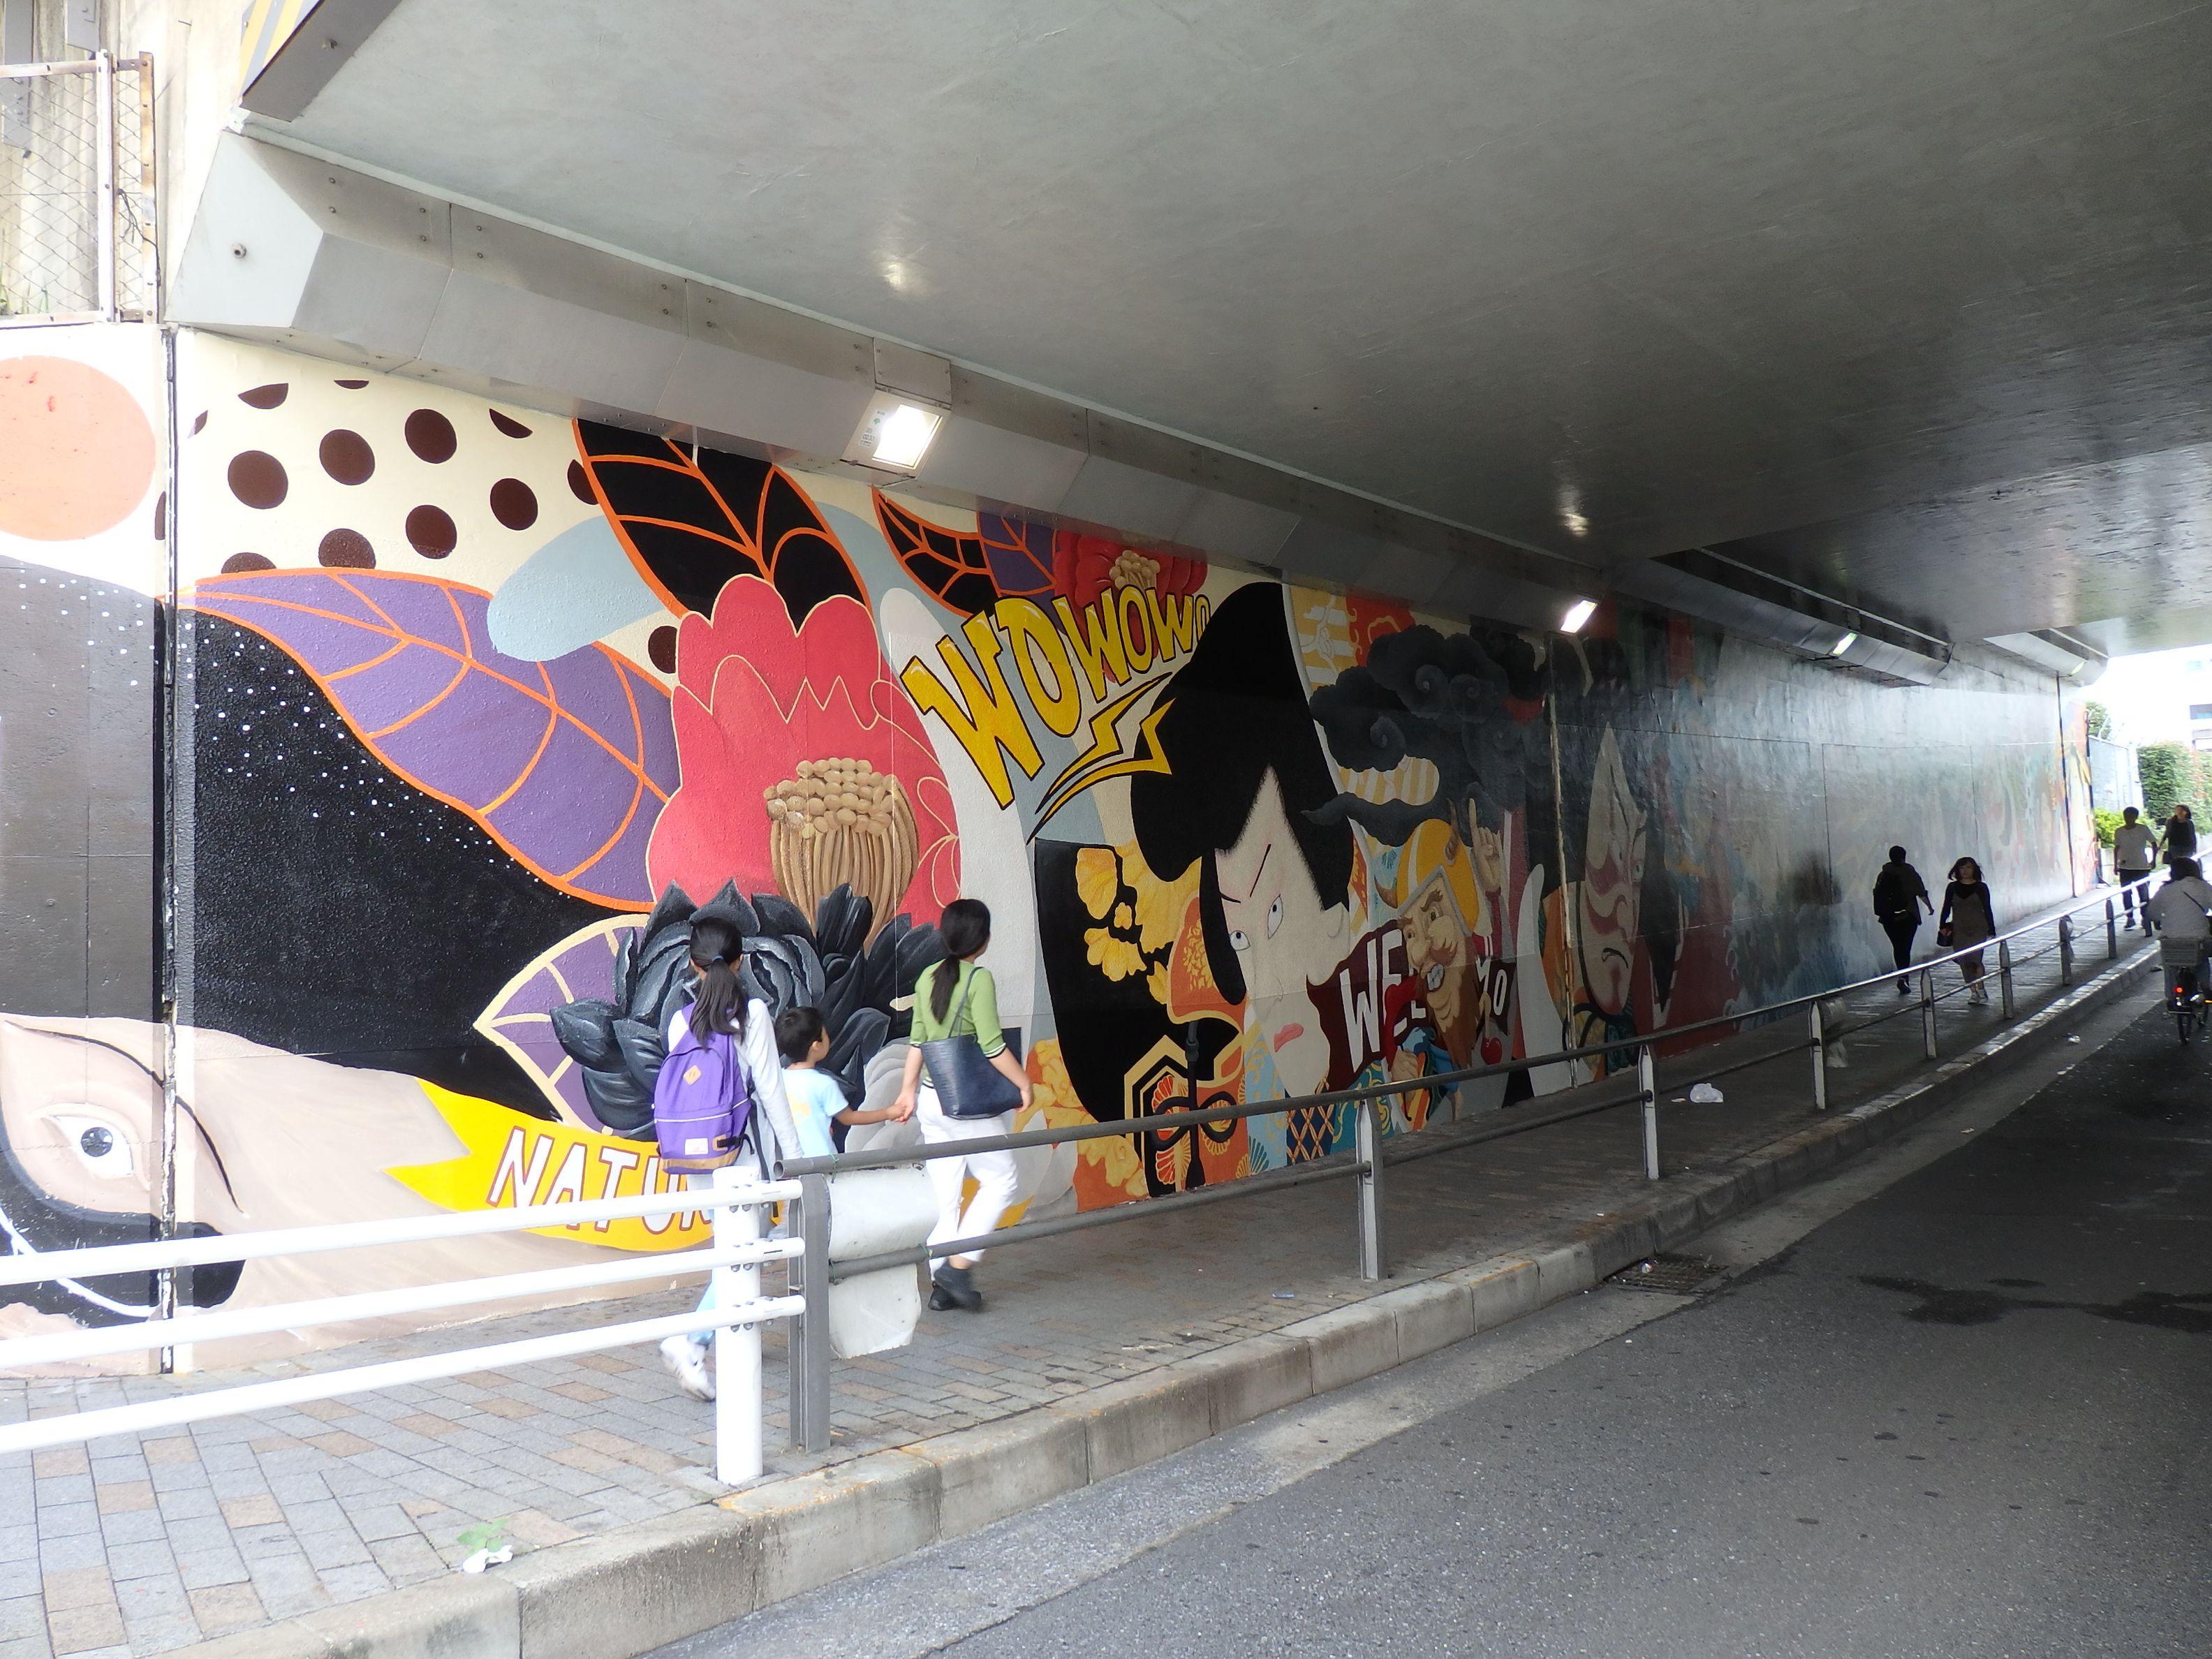 shinjuku creators festival we hold kabukicho art project exhibition